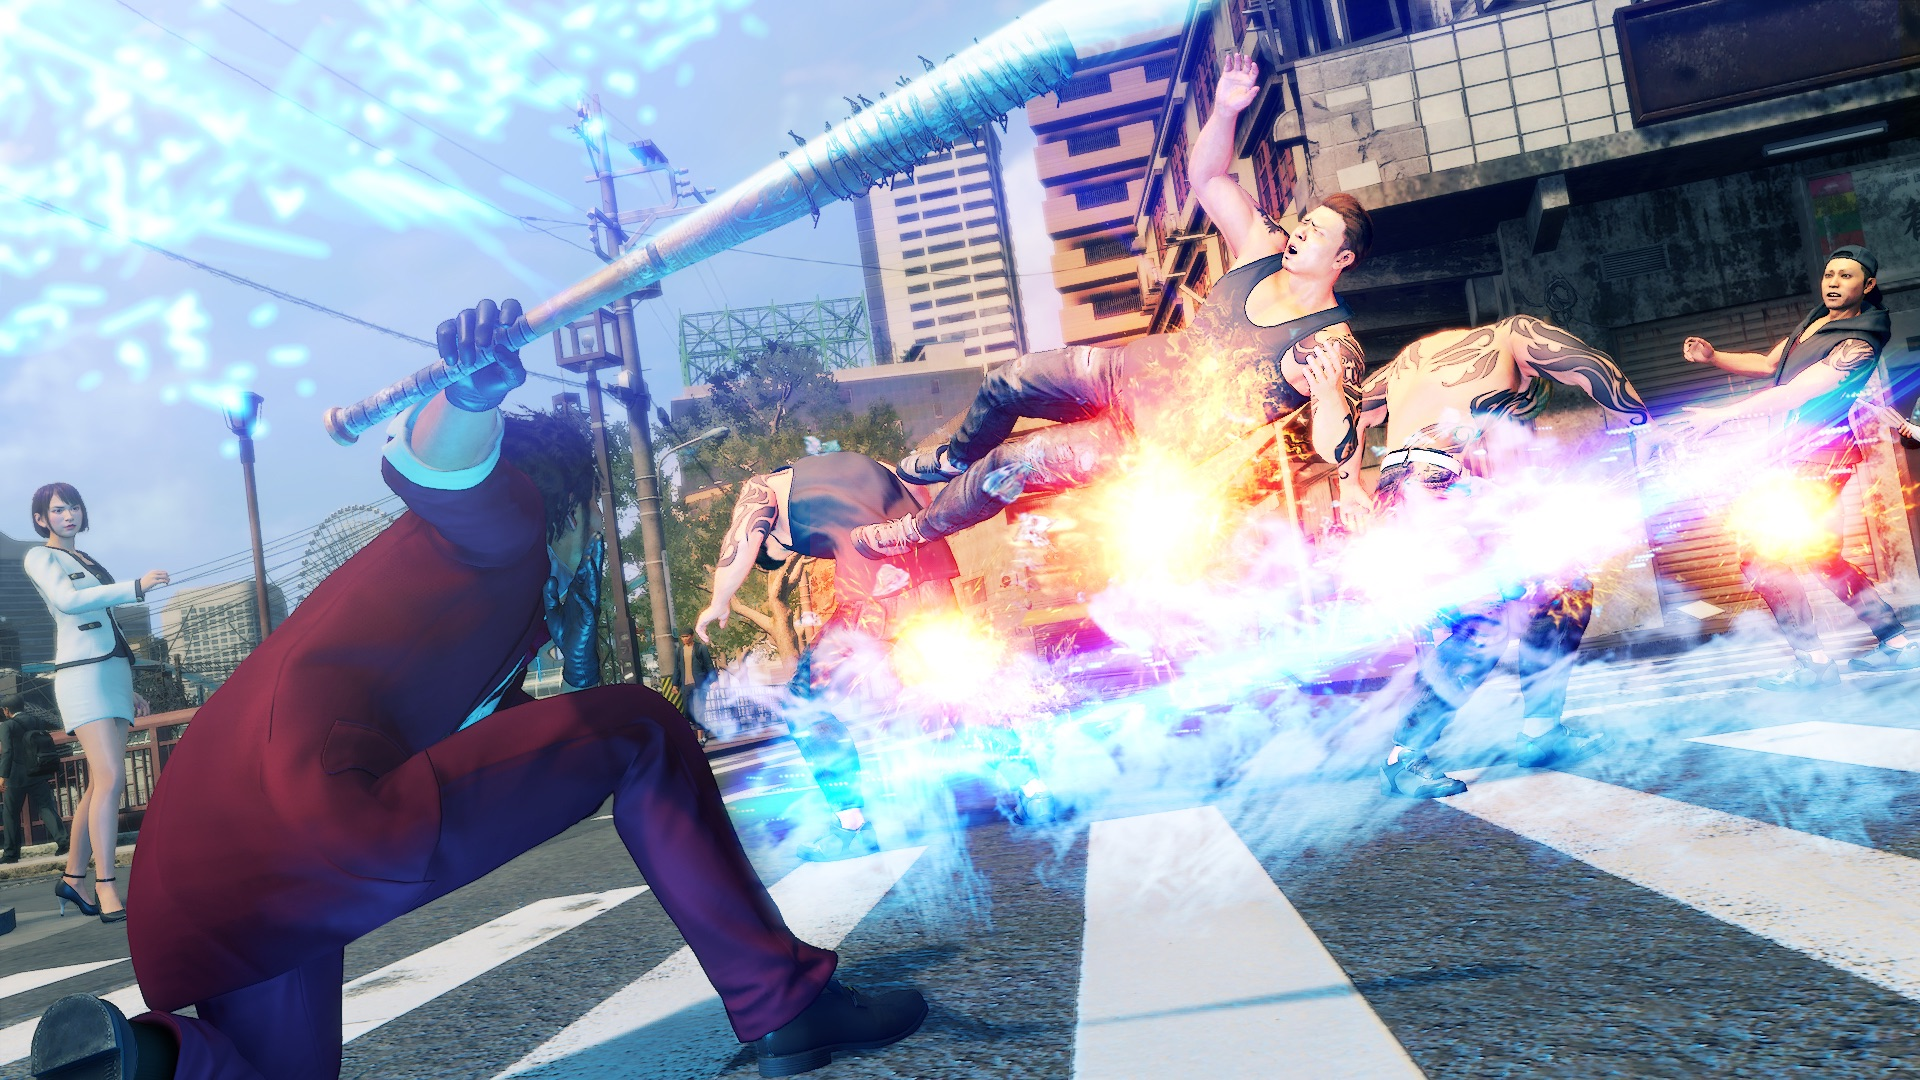 Yakuza: Like a Dragon screenshot: Ichiban sweeps a bunch of bad guys off their feet with his trusty bat.